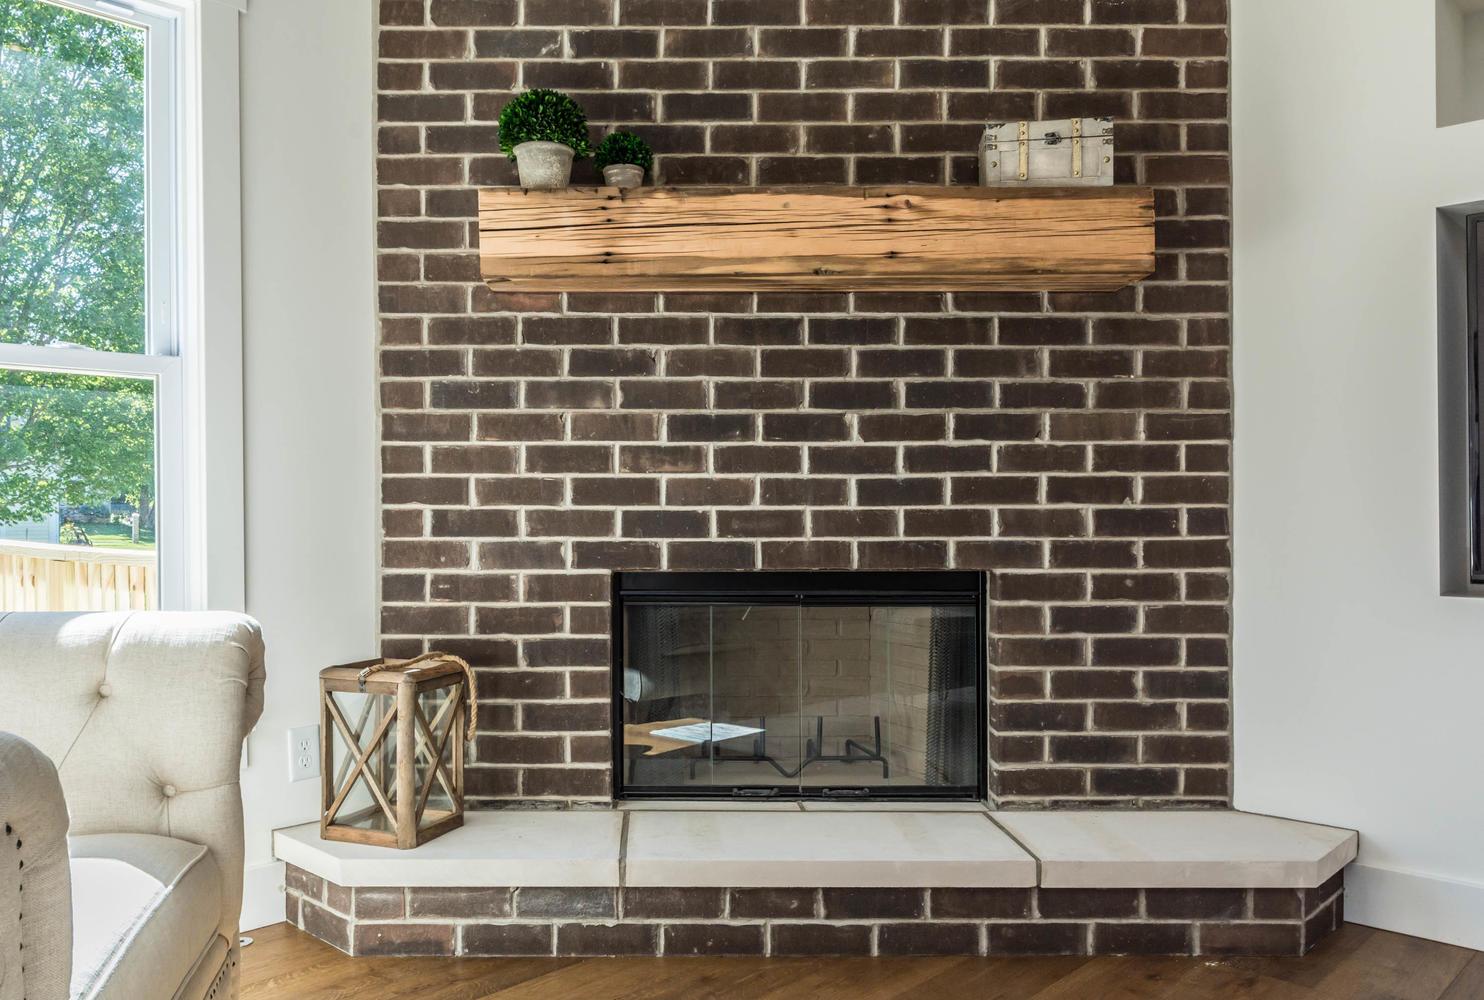 5004 Bud Thompson Ct-large-037-25-Fireplace Detail-1485×1000-72dpi